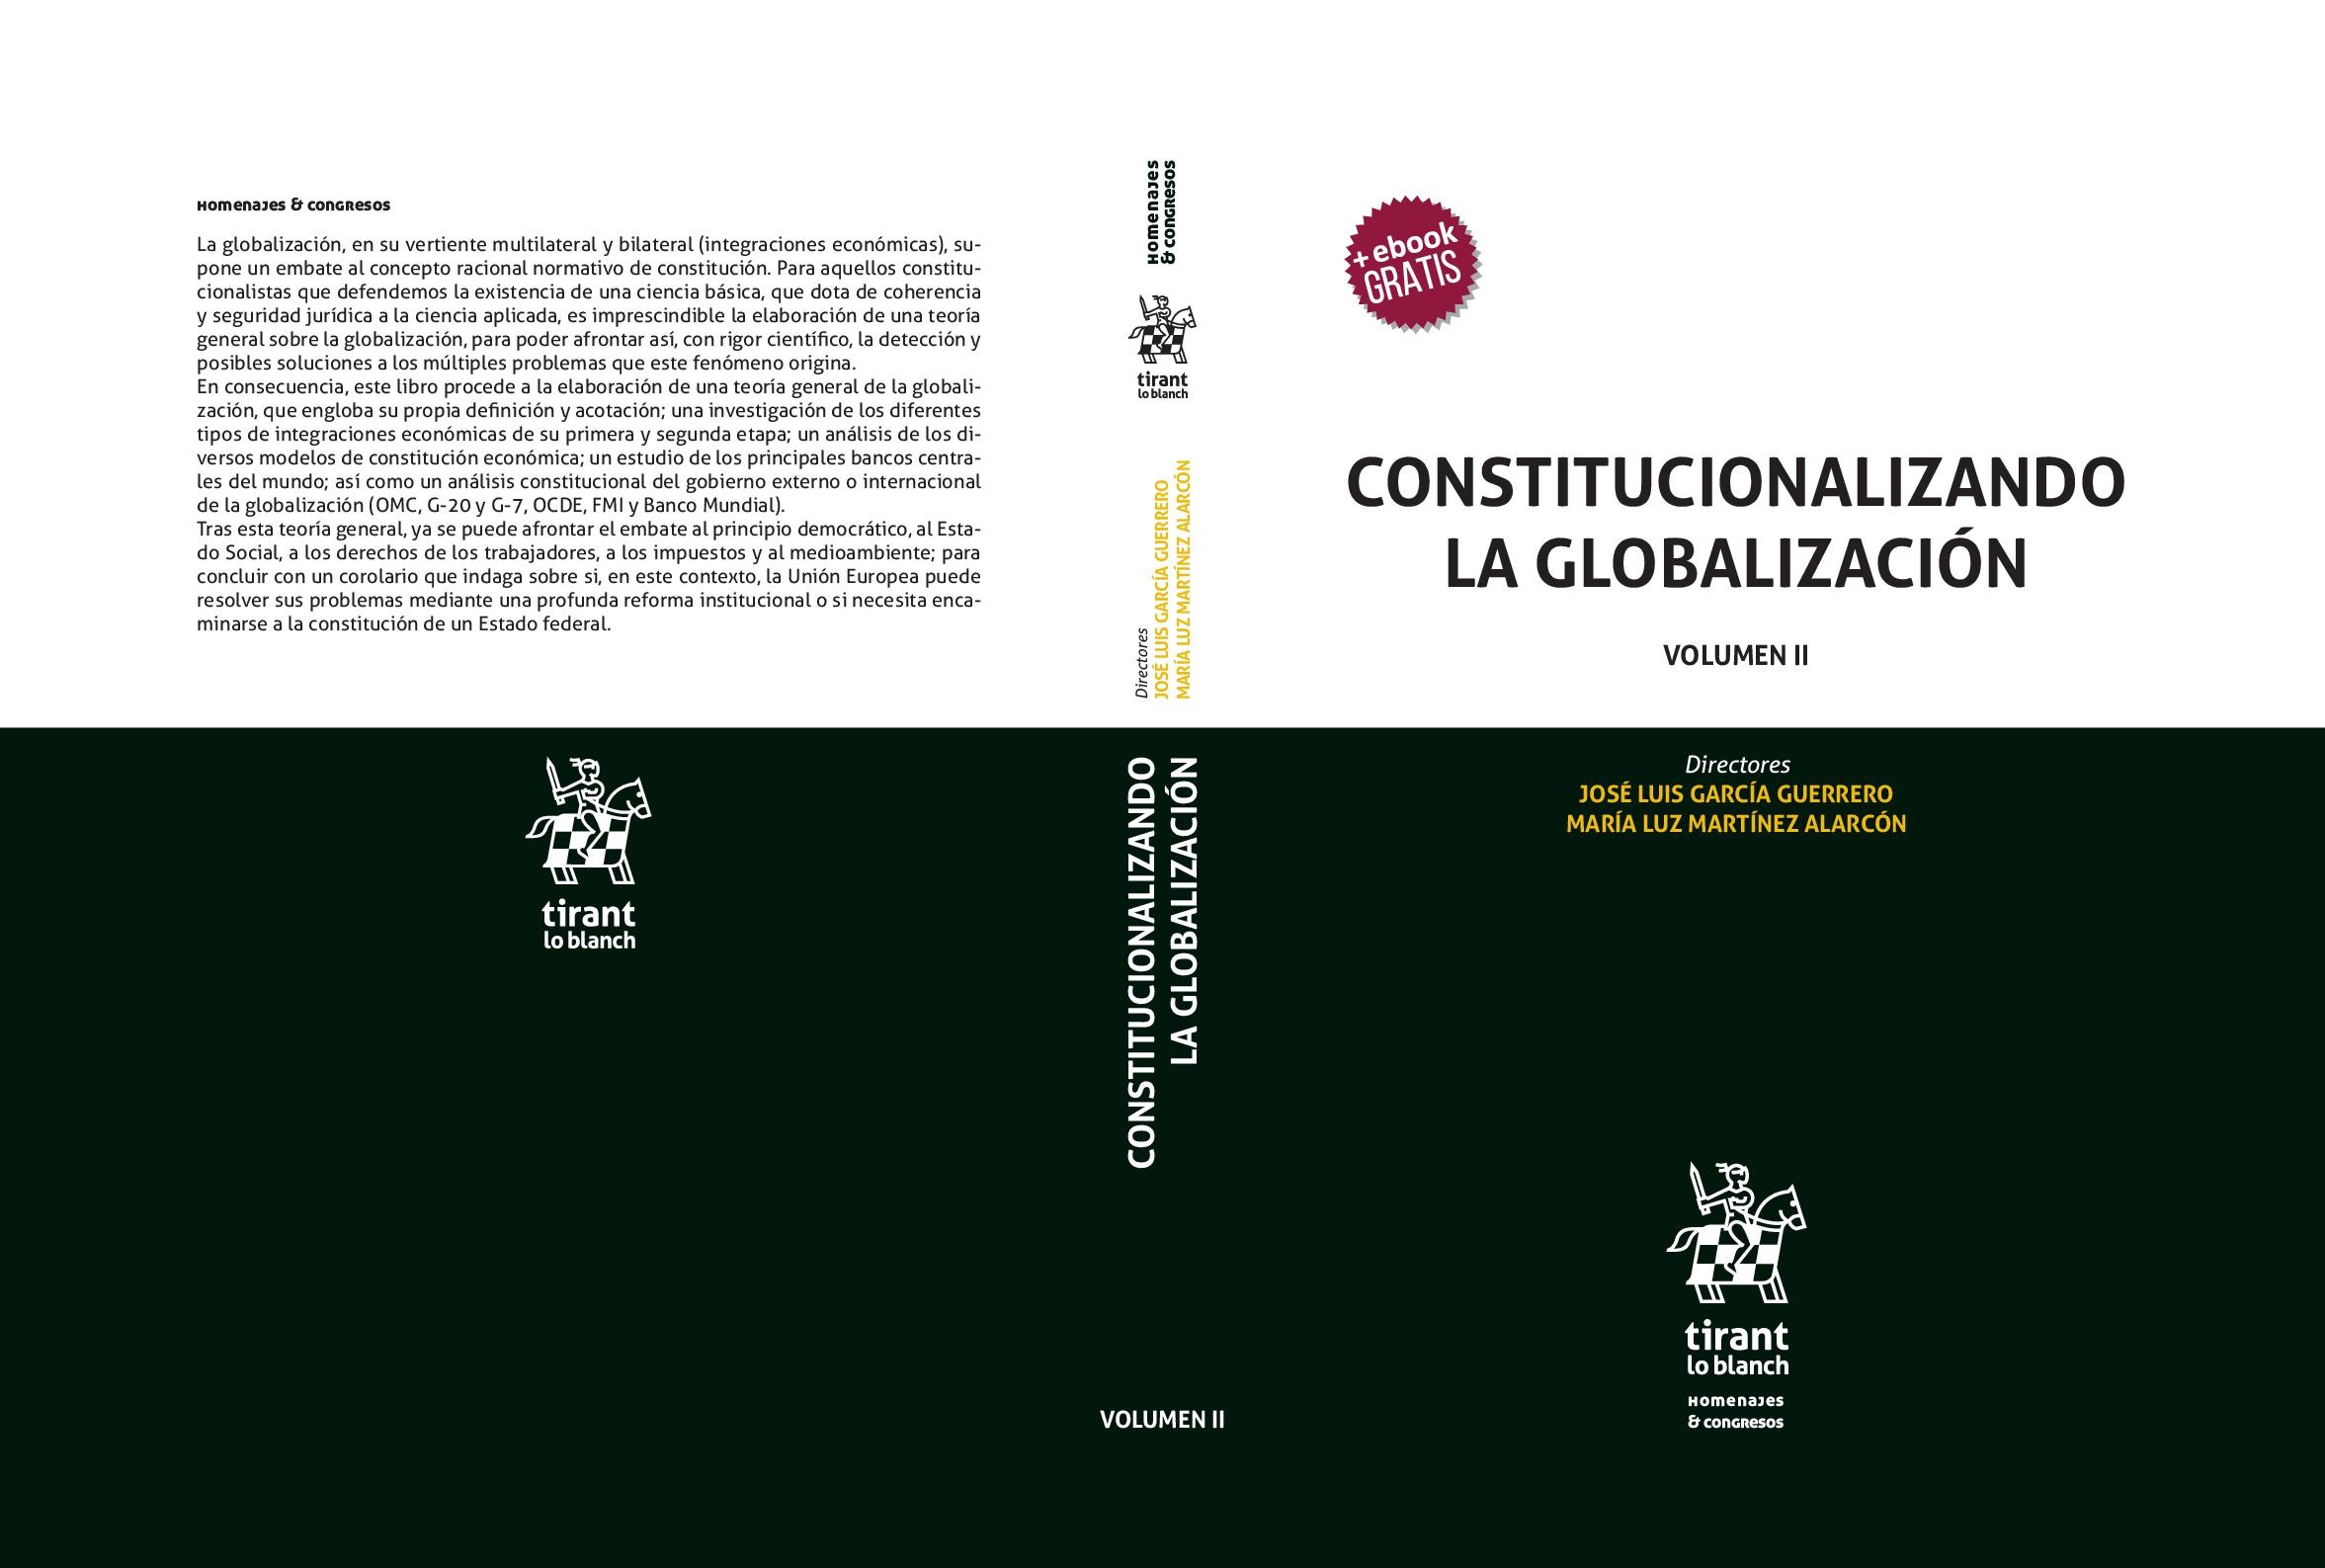 Portada Volumen II-001.jpg